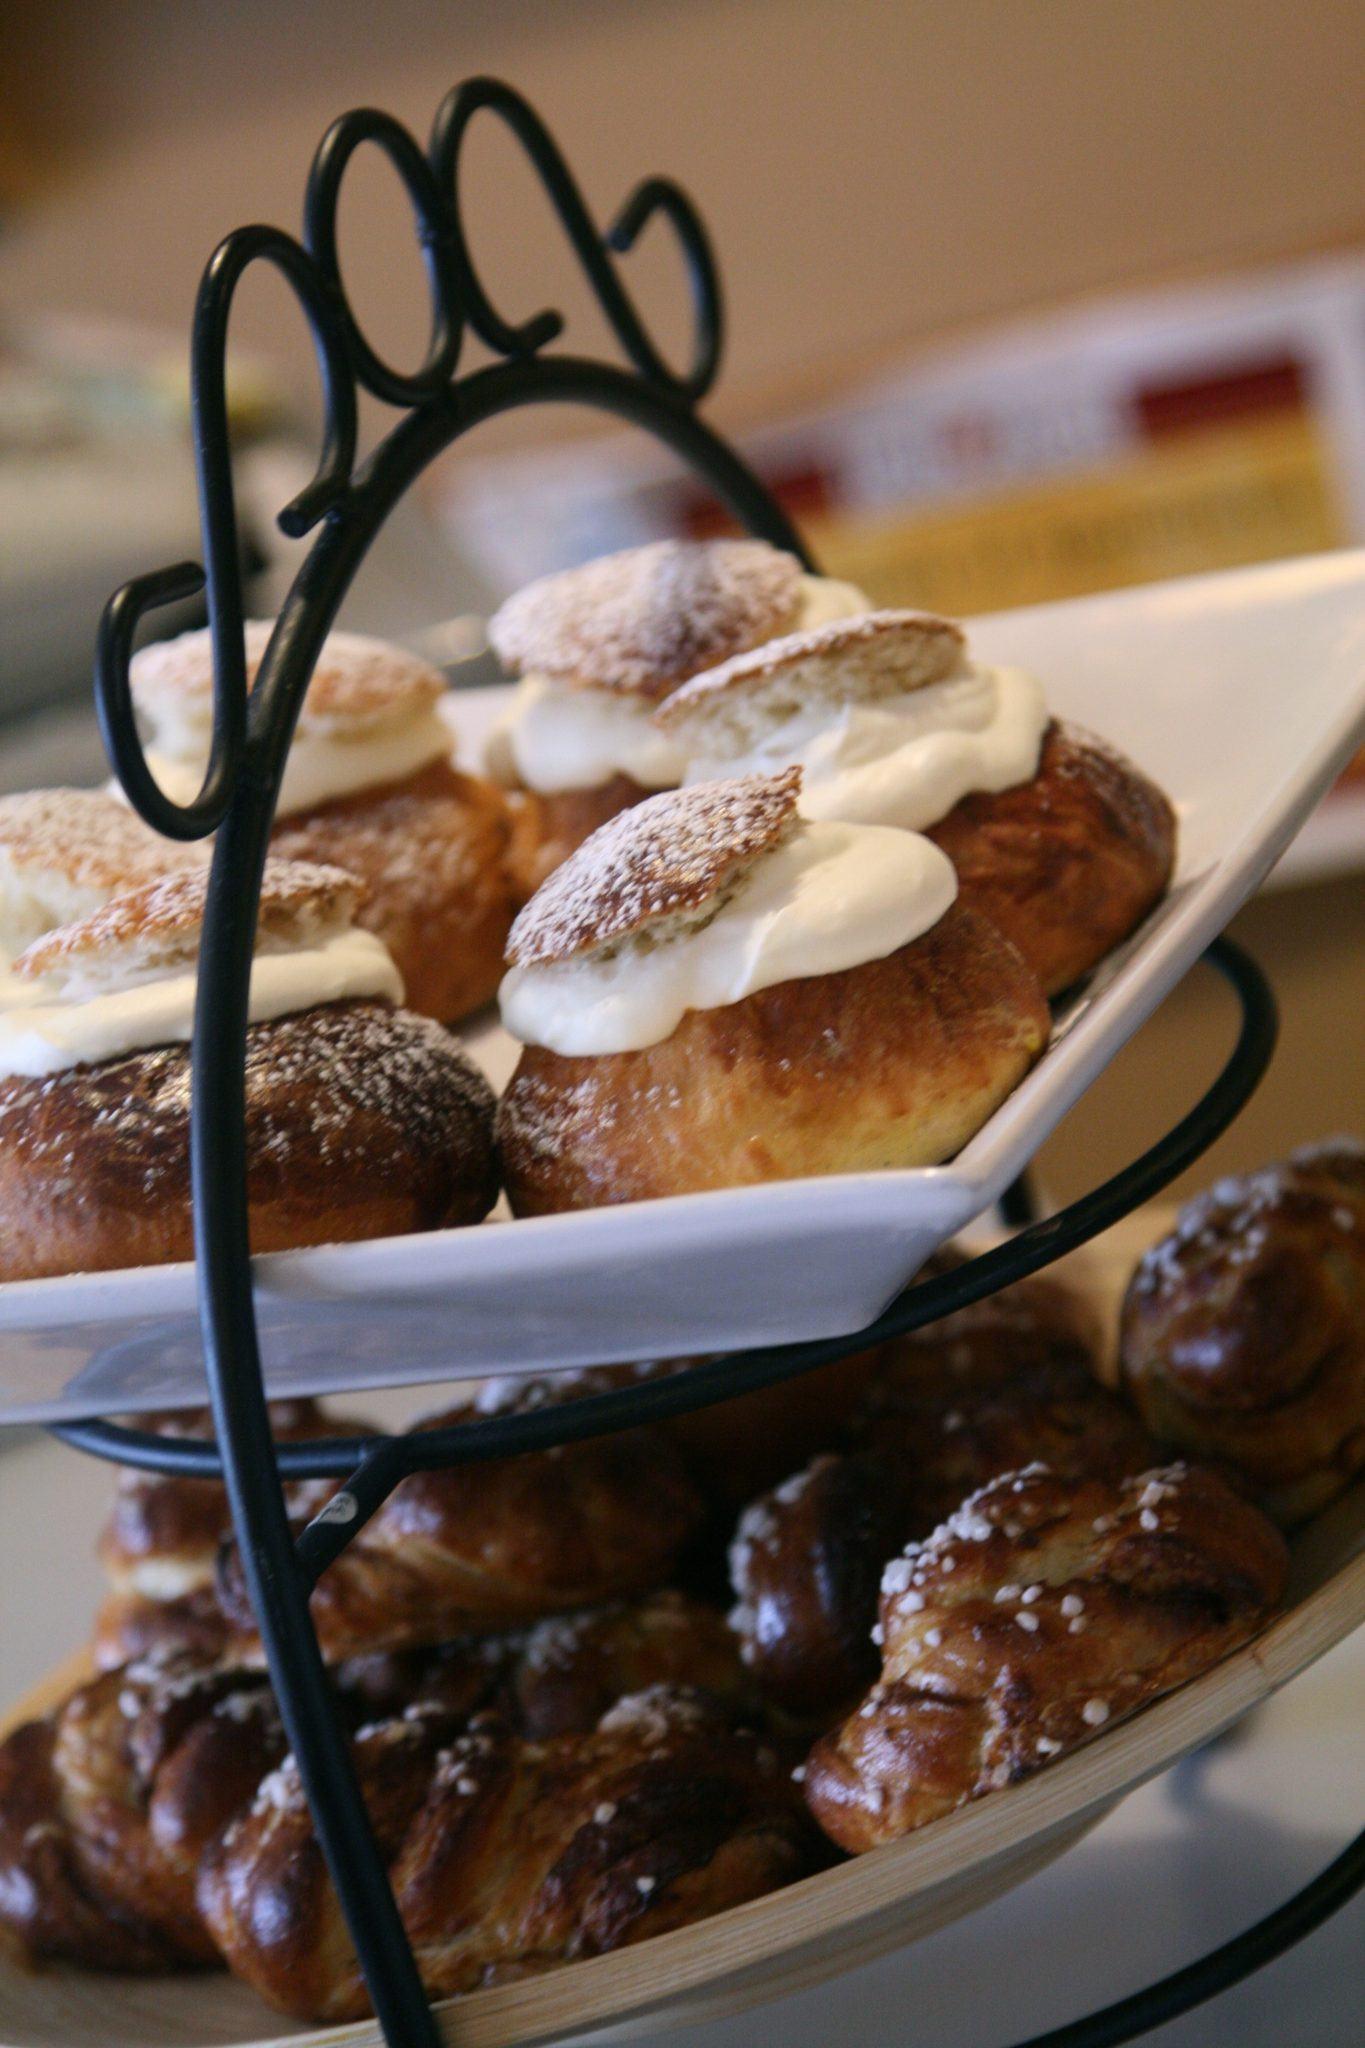 Swedish bakery in Toronto